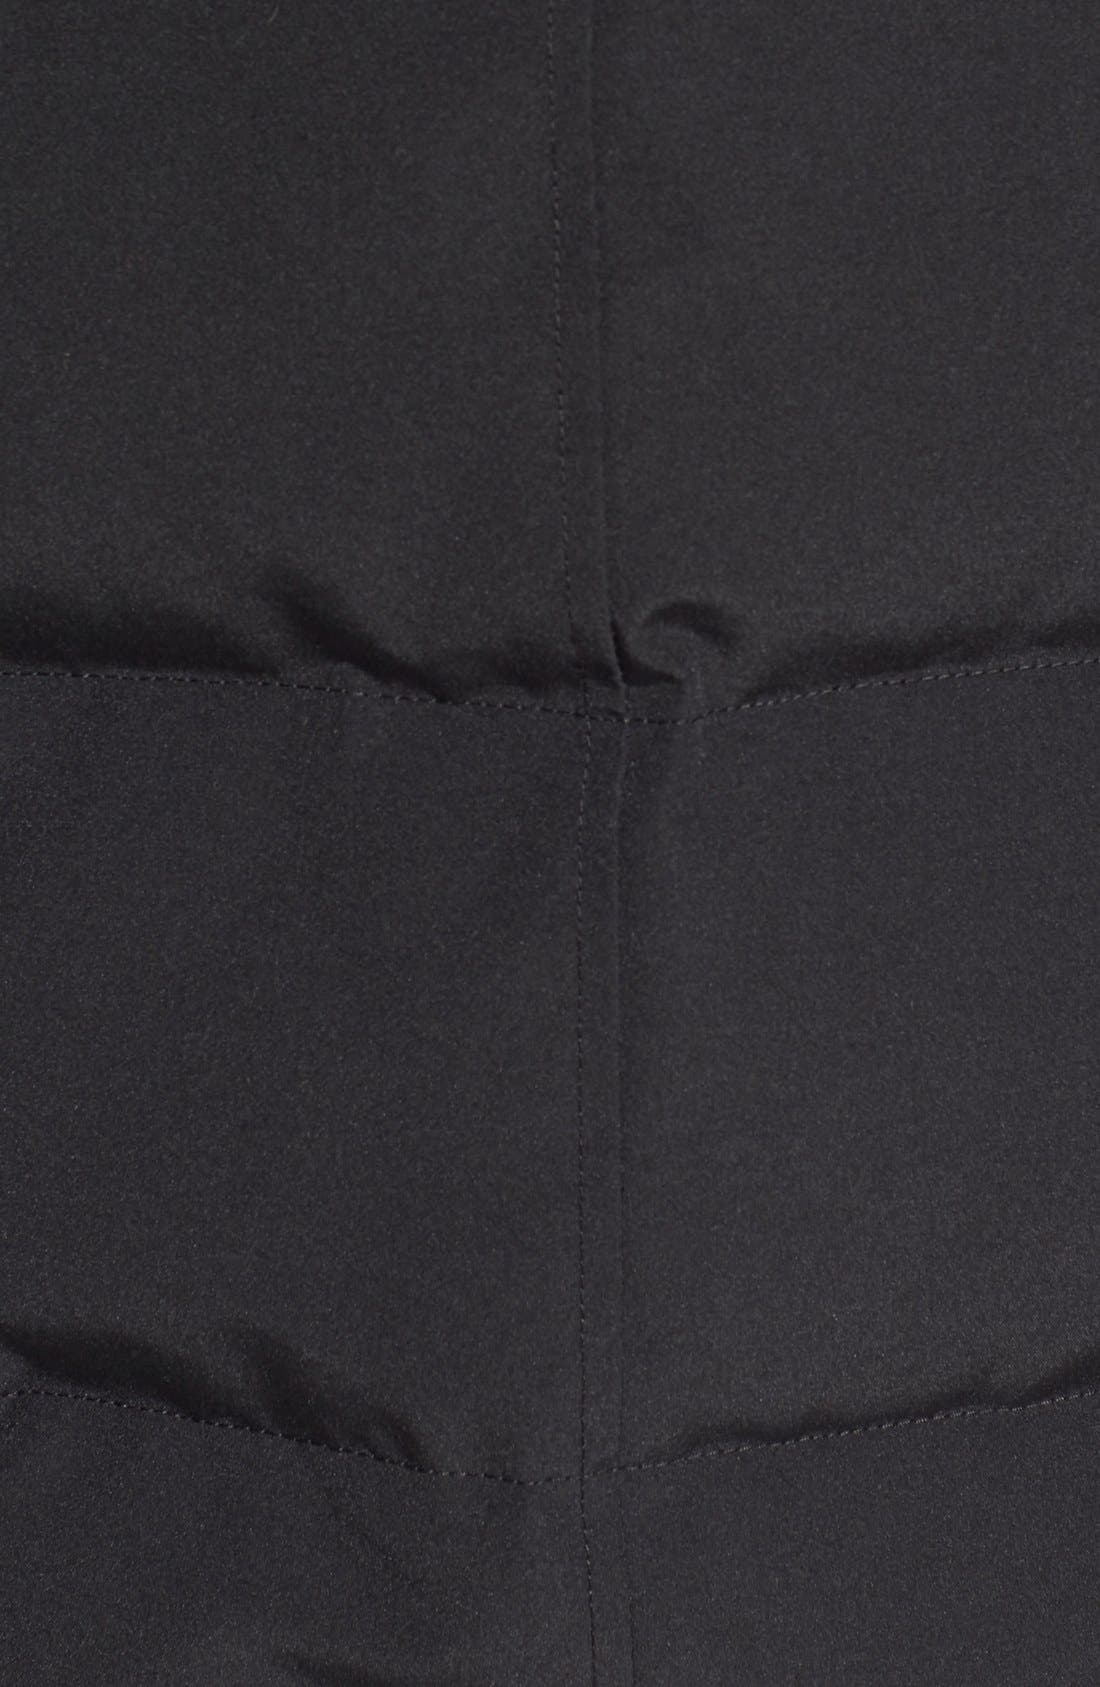 'MacMillan' Slim Fit Hooded Parka,                             Alternate thumbnail 6, color,                             BLACK